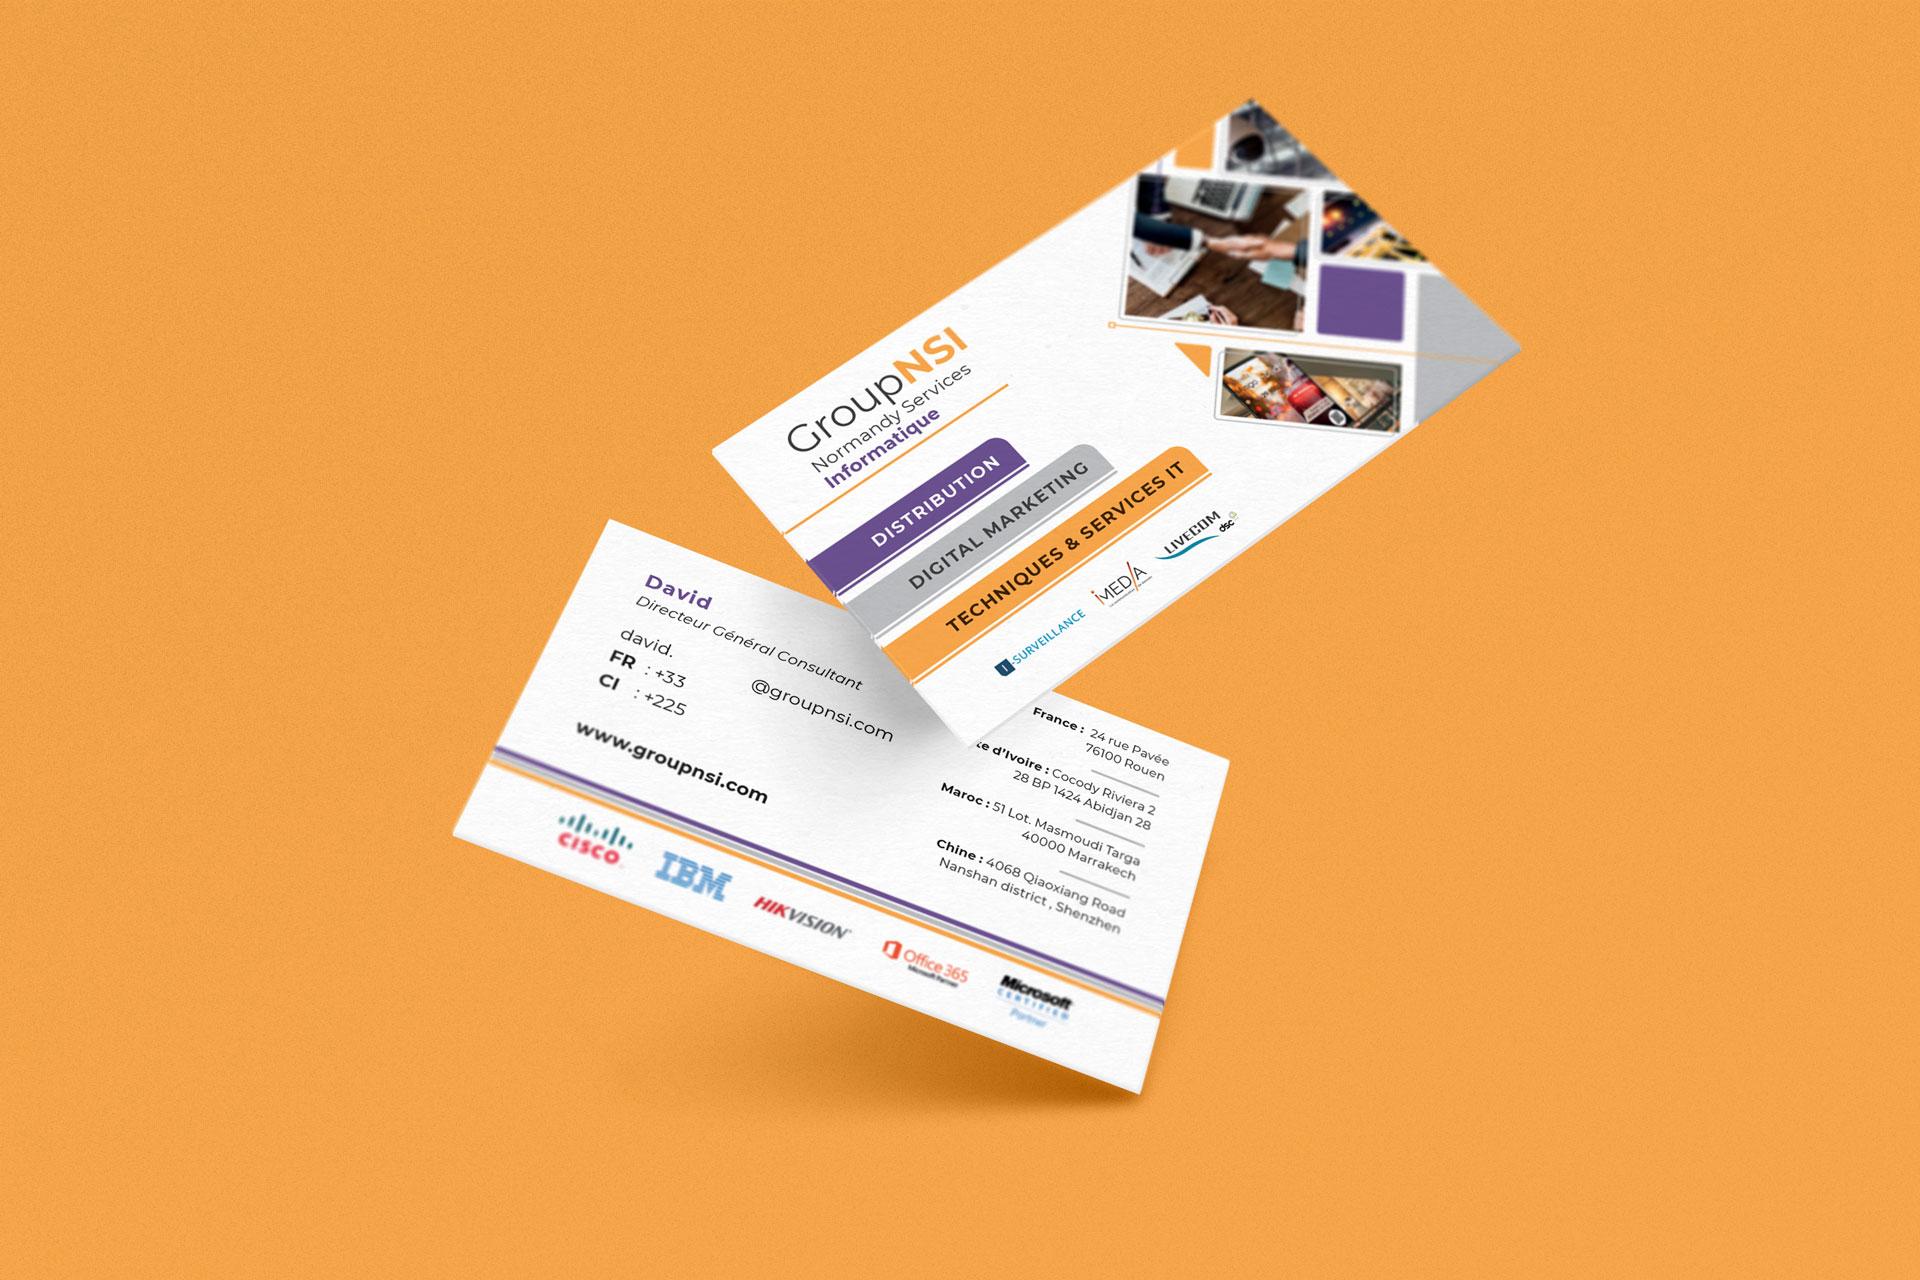 mockup carte de visite group nsi rouen client i-media agence de communication digitale